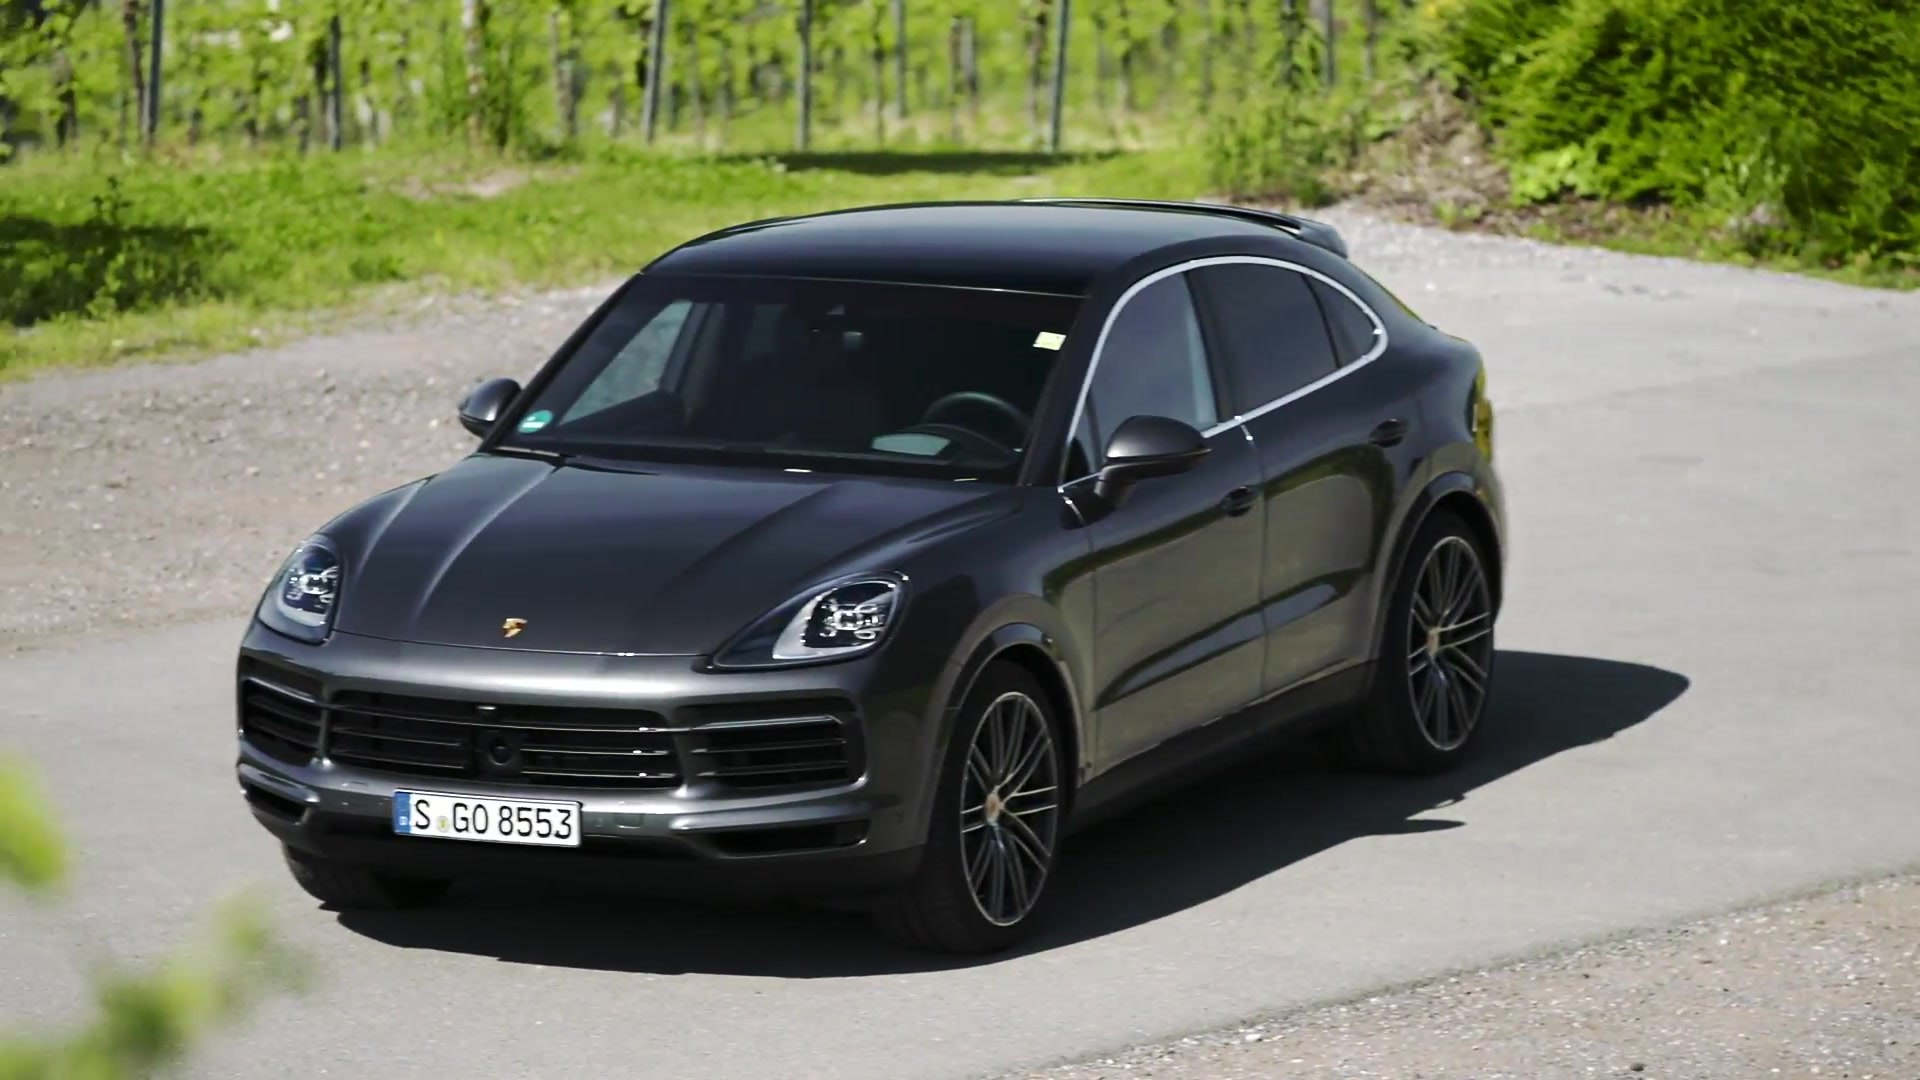 Porsche Cayenne S Coupe Design In Quarzite Grey Video Dailymotion